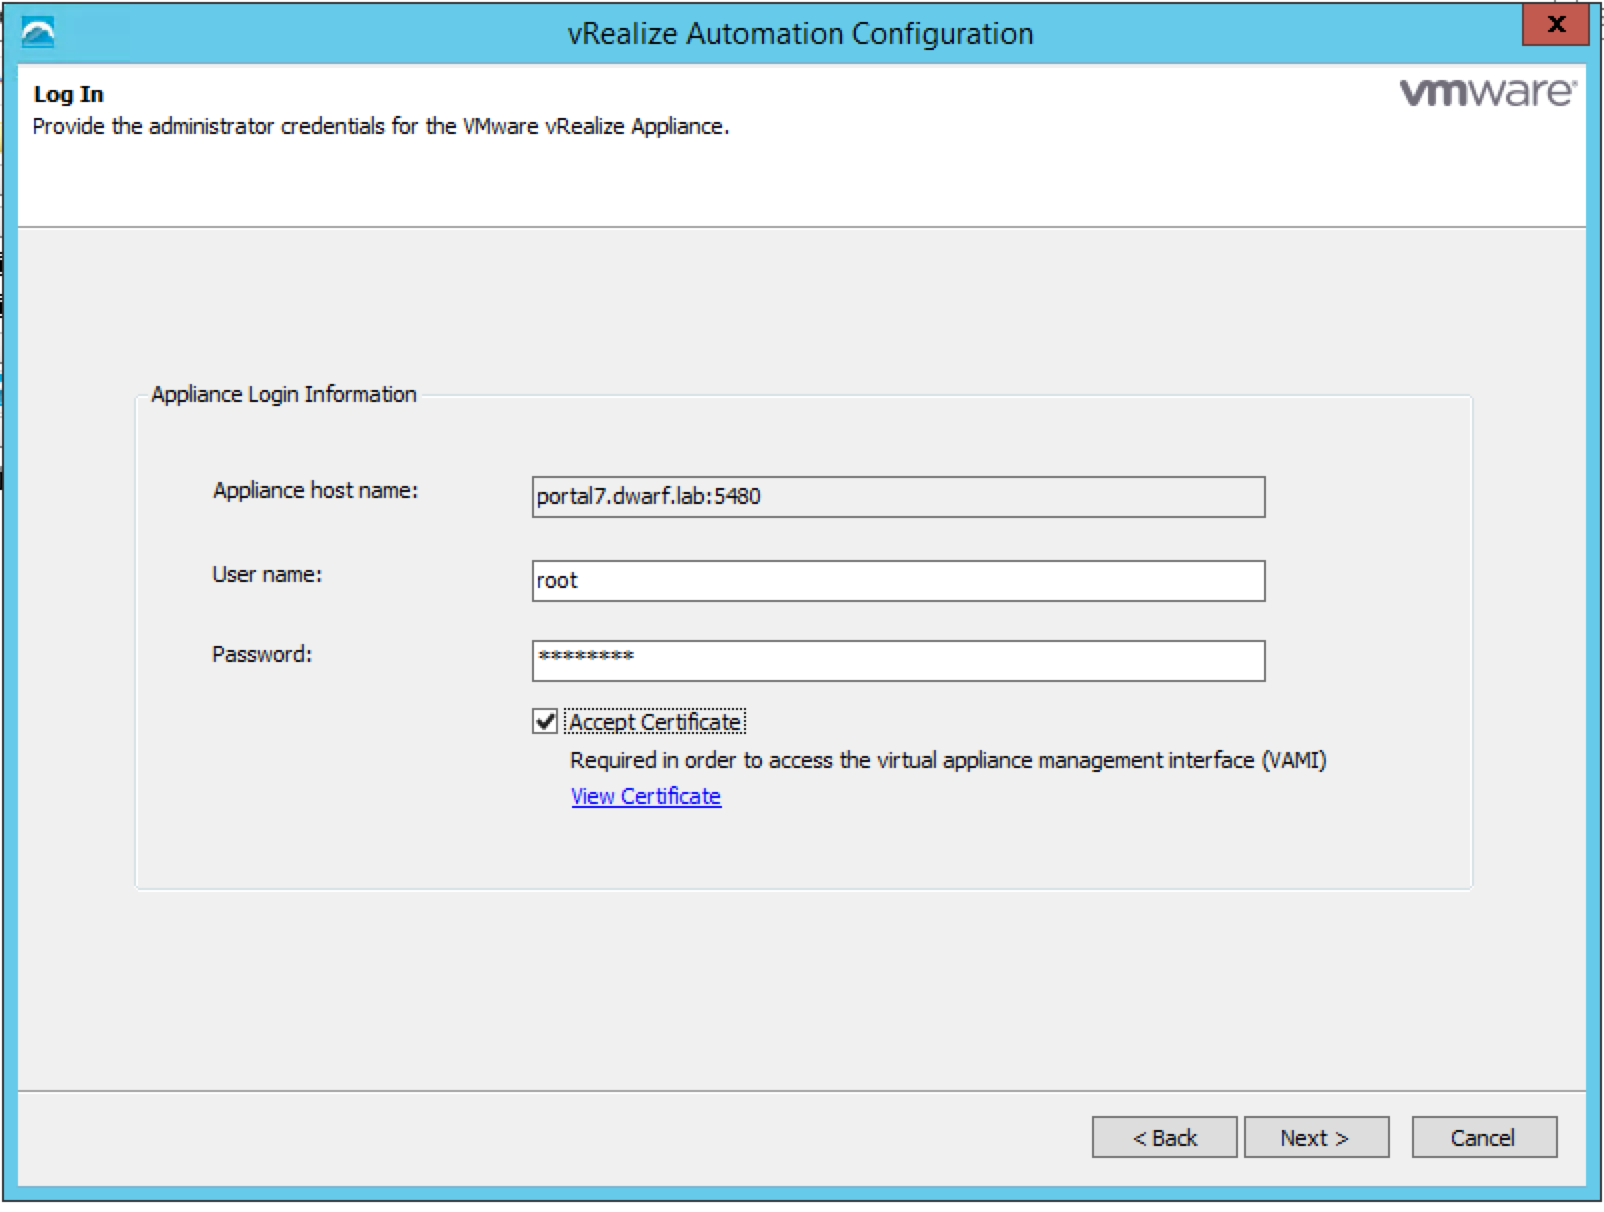 vRA 7.0.1 IaaS Installation – 3